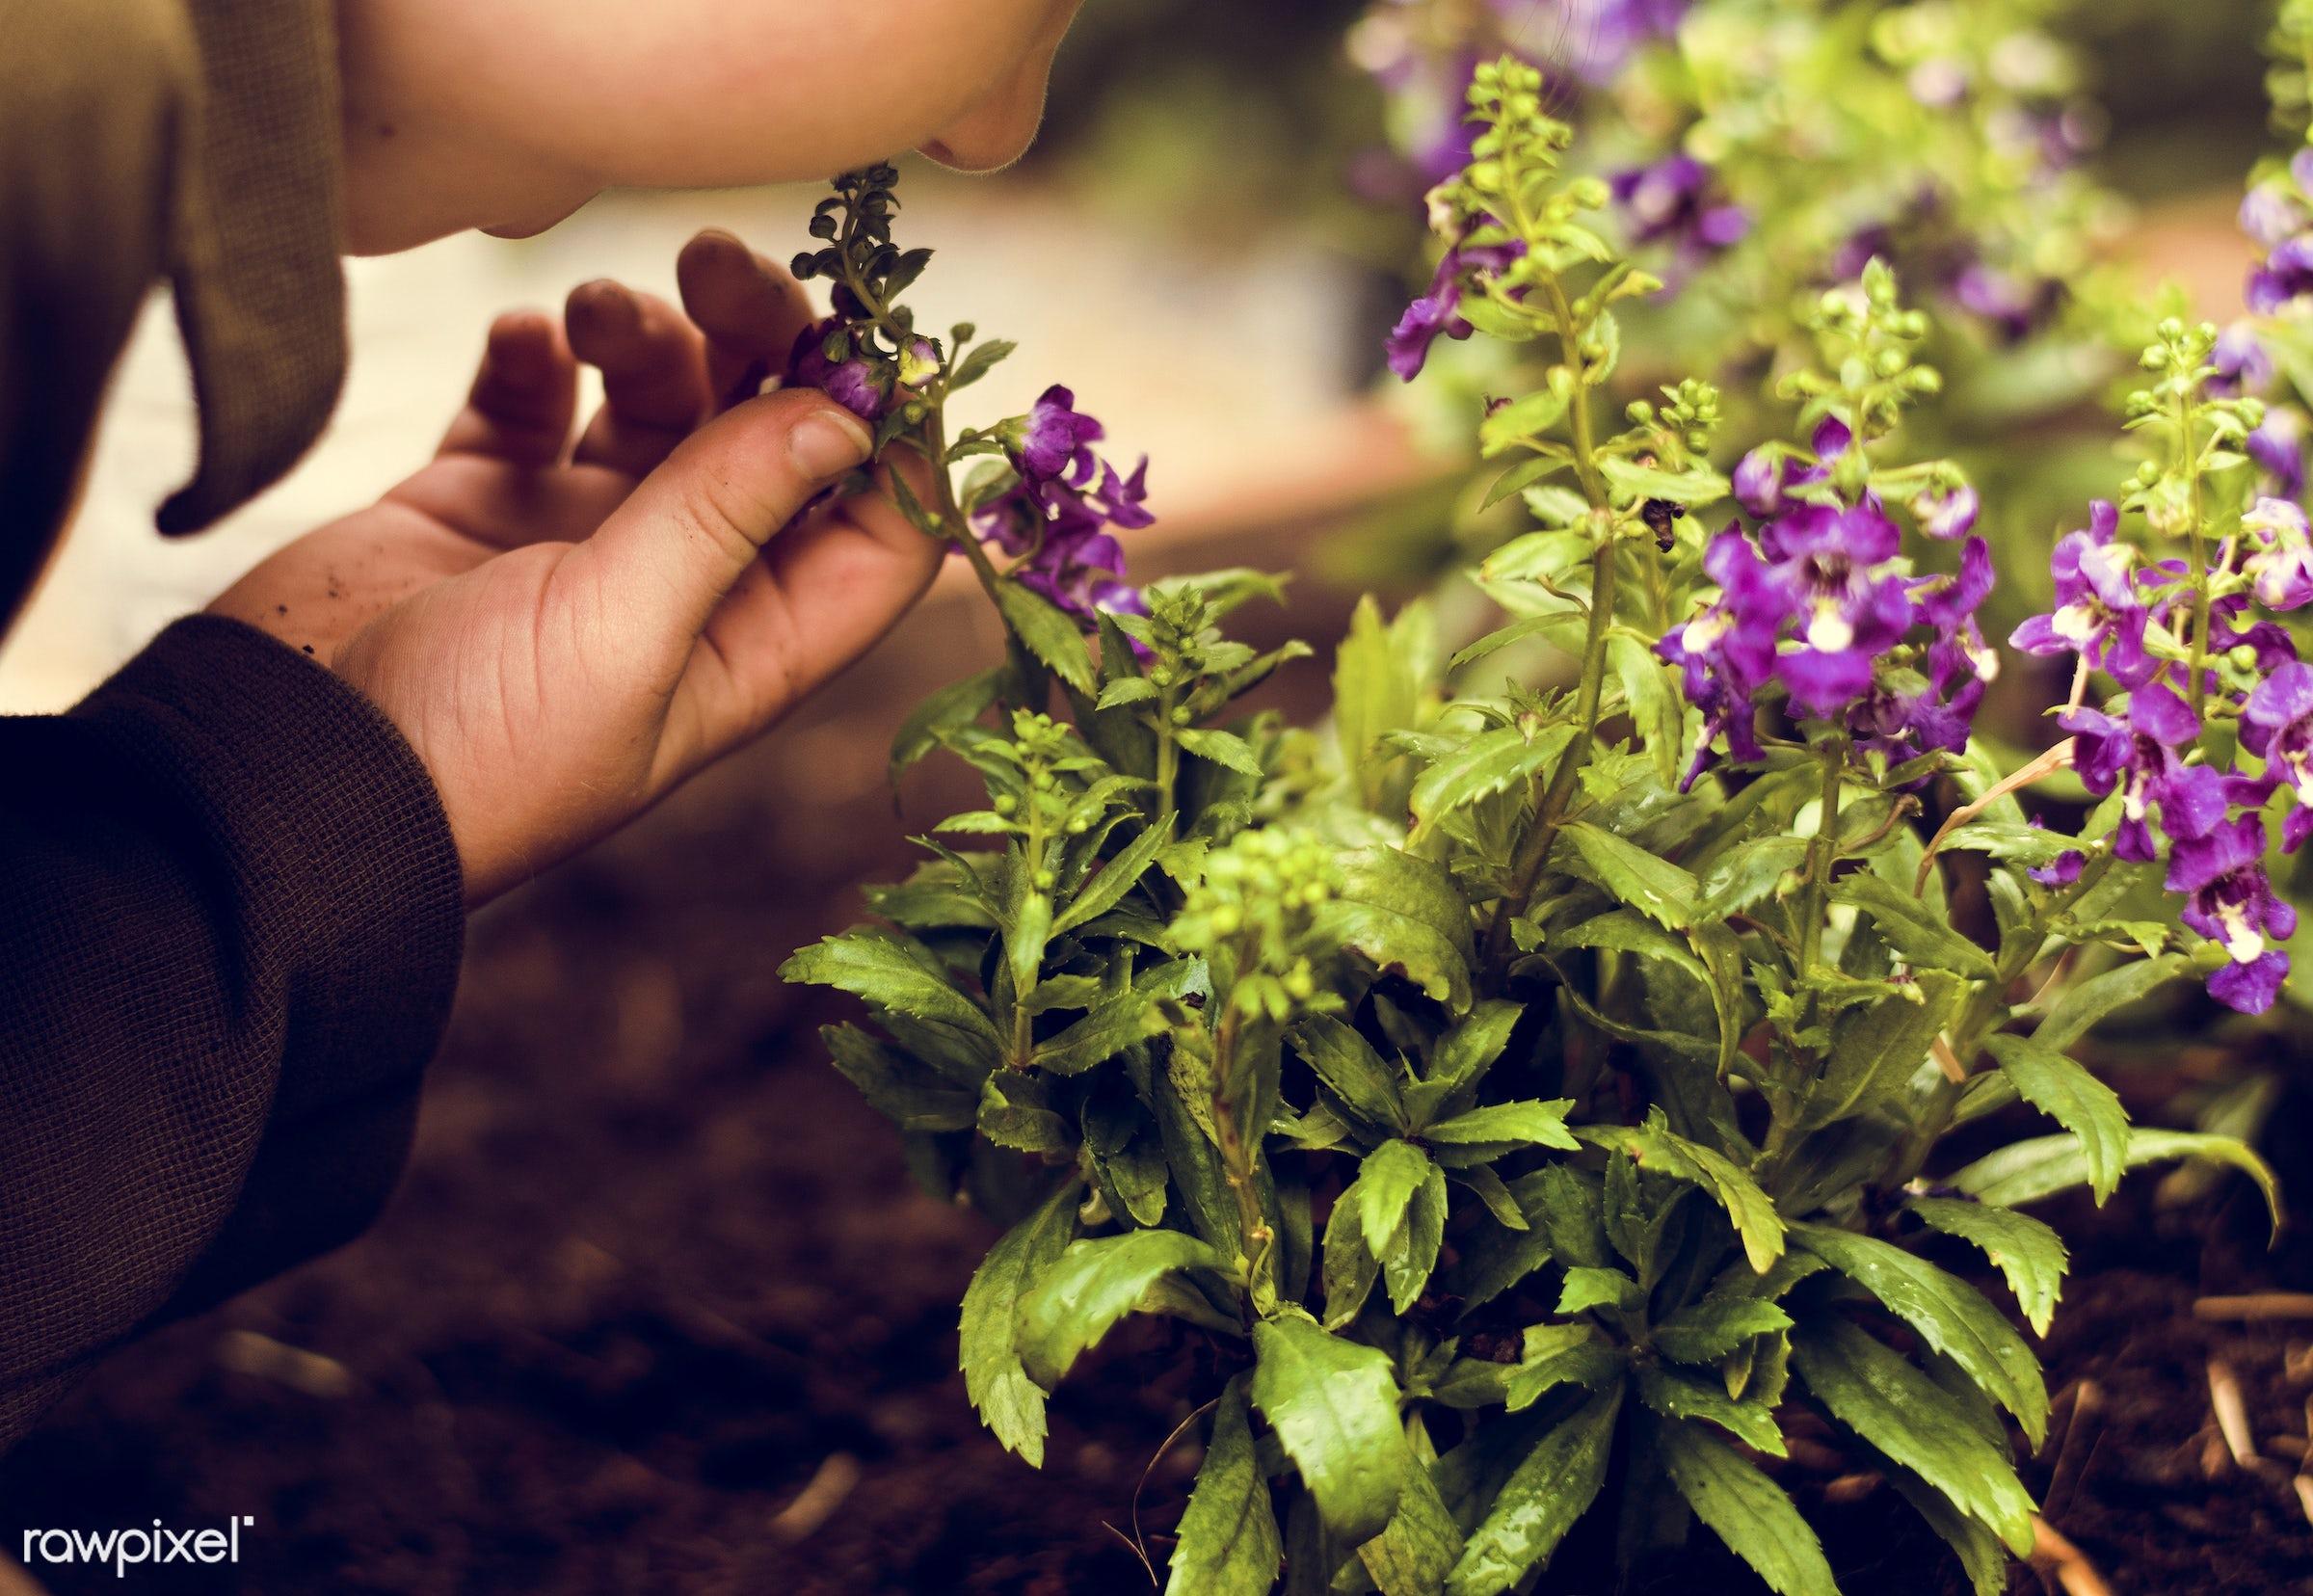 countryside, diverse, greenhouse, botanical, plantation, people, kid, teamwork, friends, tree, nature, lifestyle, friendship...